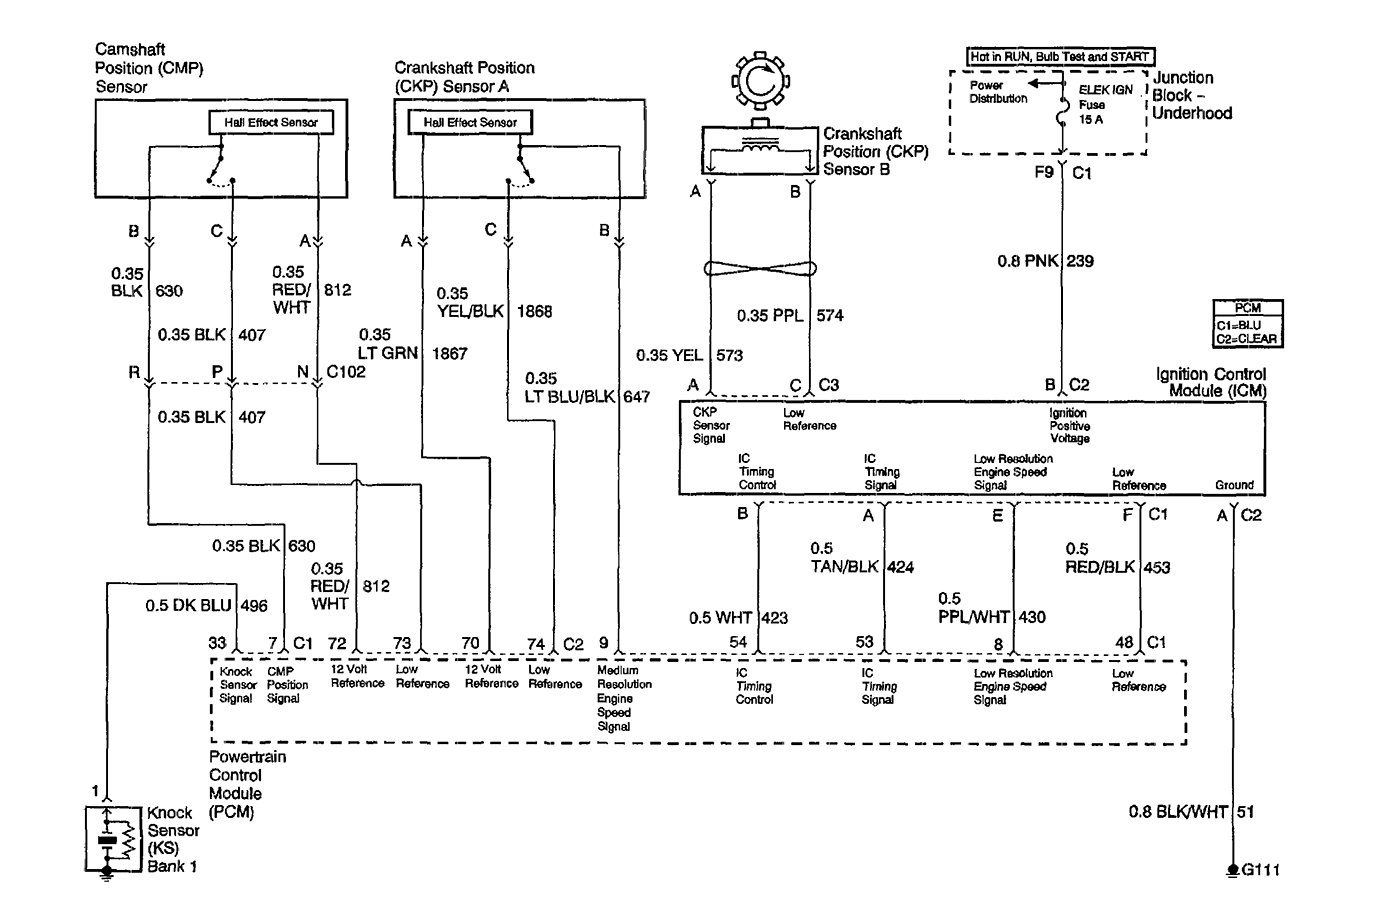 2004 Pontiac Montana Wiring Diagrams Wiring Diagram Miss Indetail Miss Indetail Led Illumina It